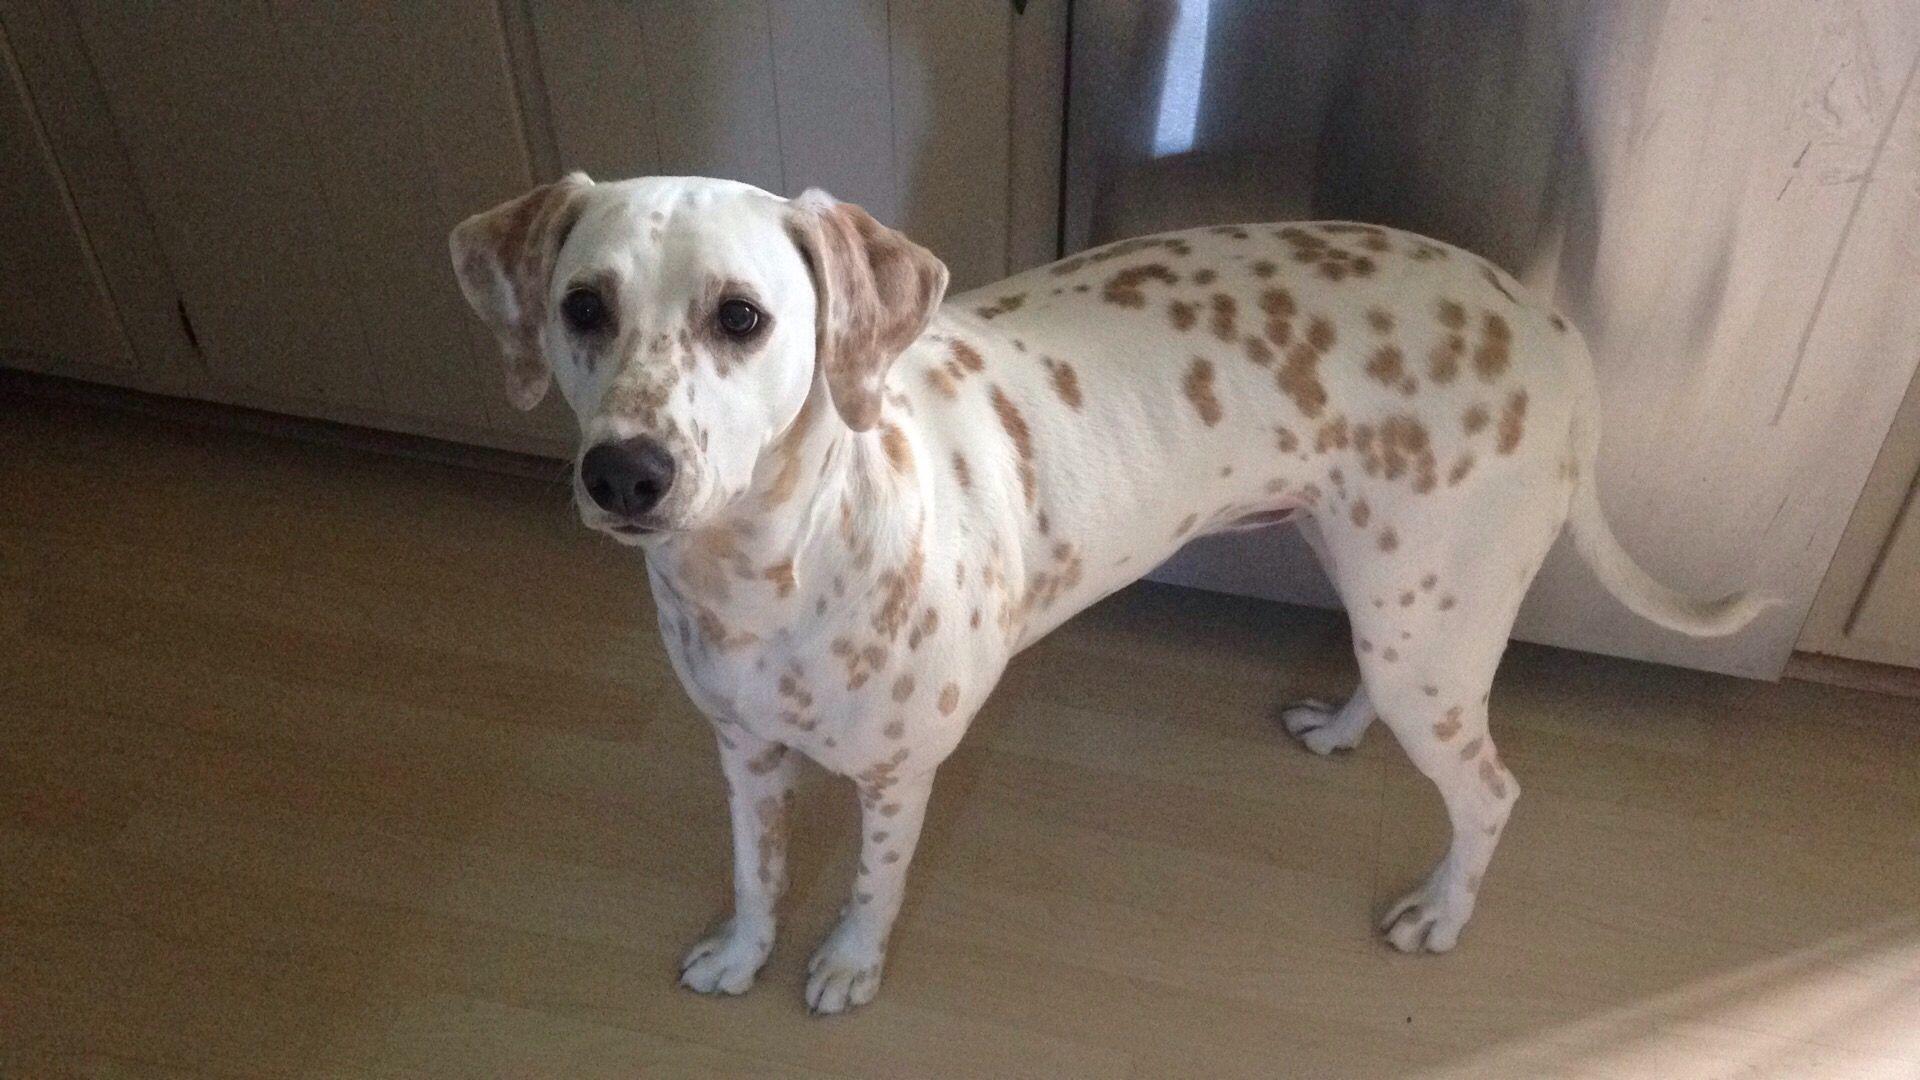 101 Dalmatians Porn ania- lemon spotted dalmation | dogs, dalmatian, animals